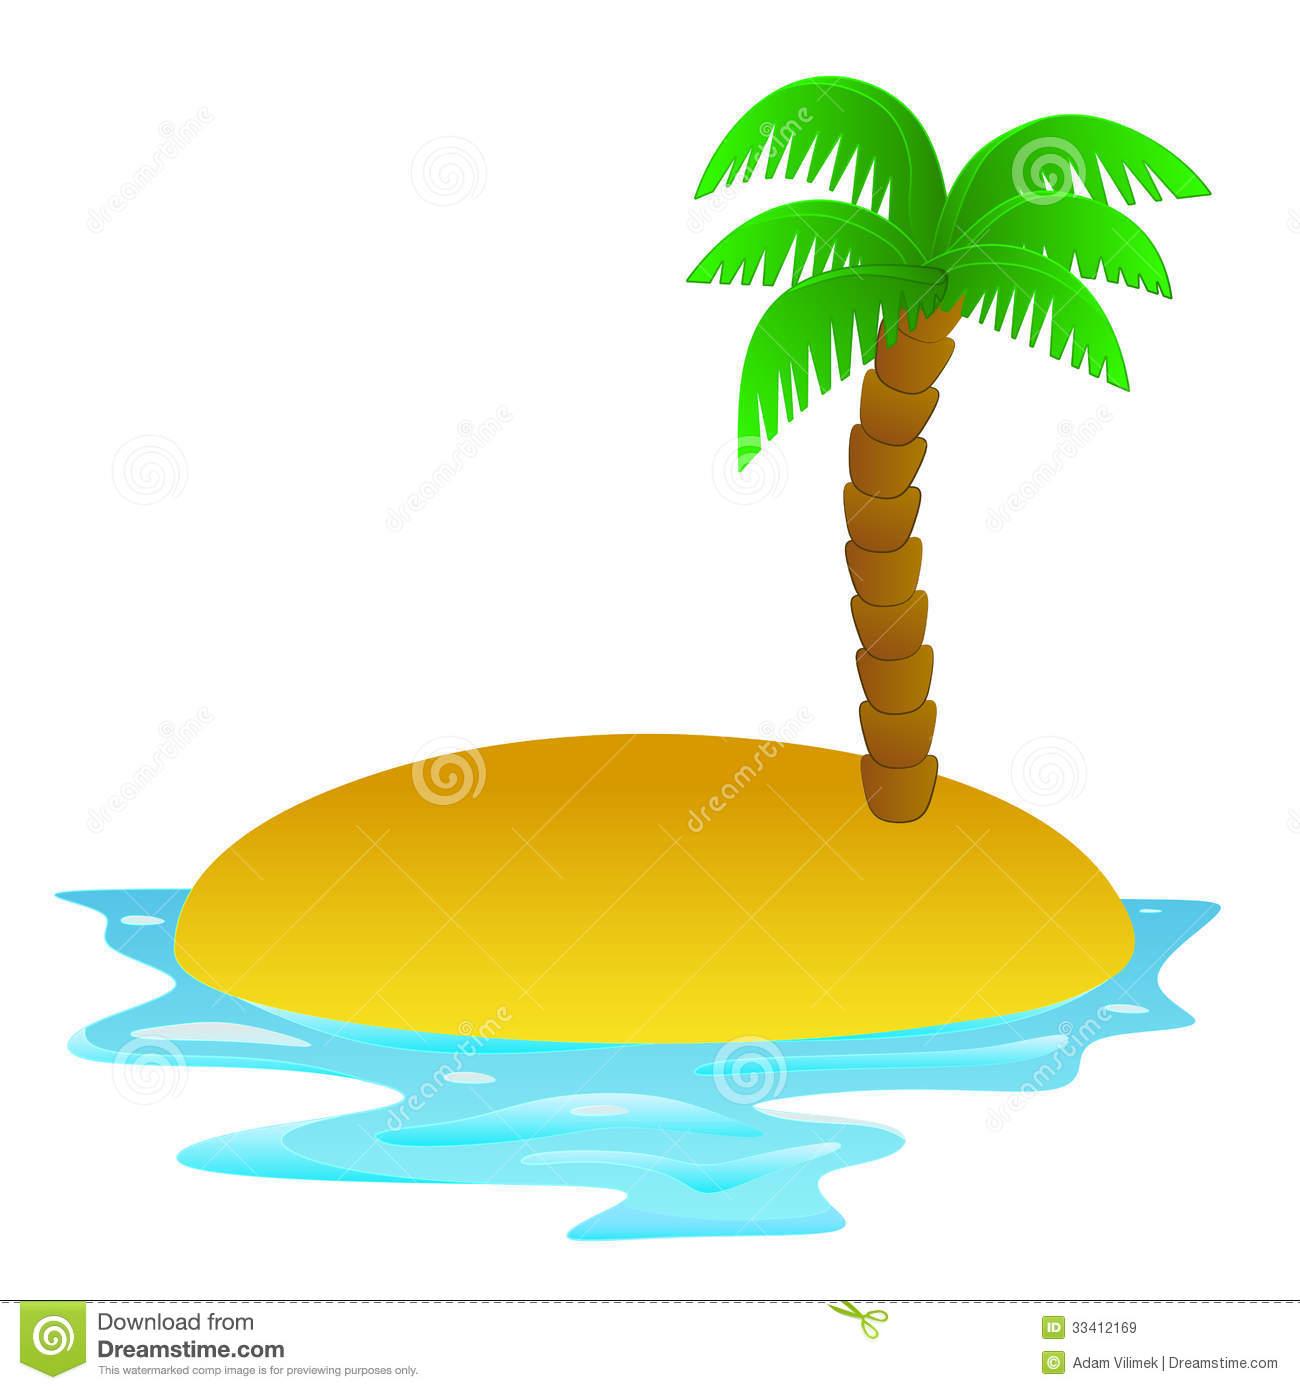 Desert island clipart free svg library download 57+ Island Clipart   ClipartLook svg library download